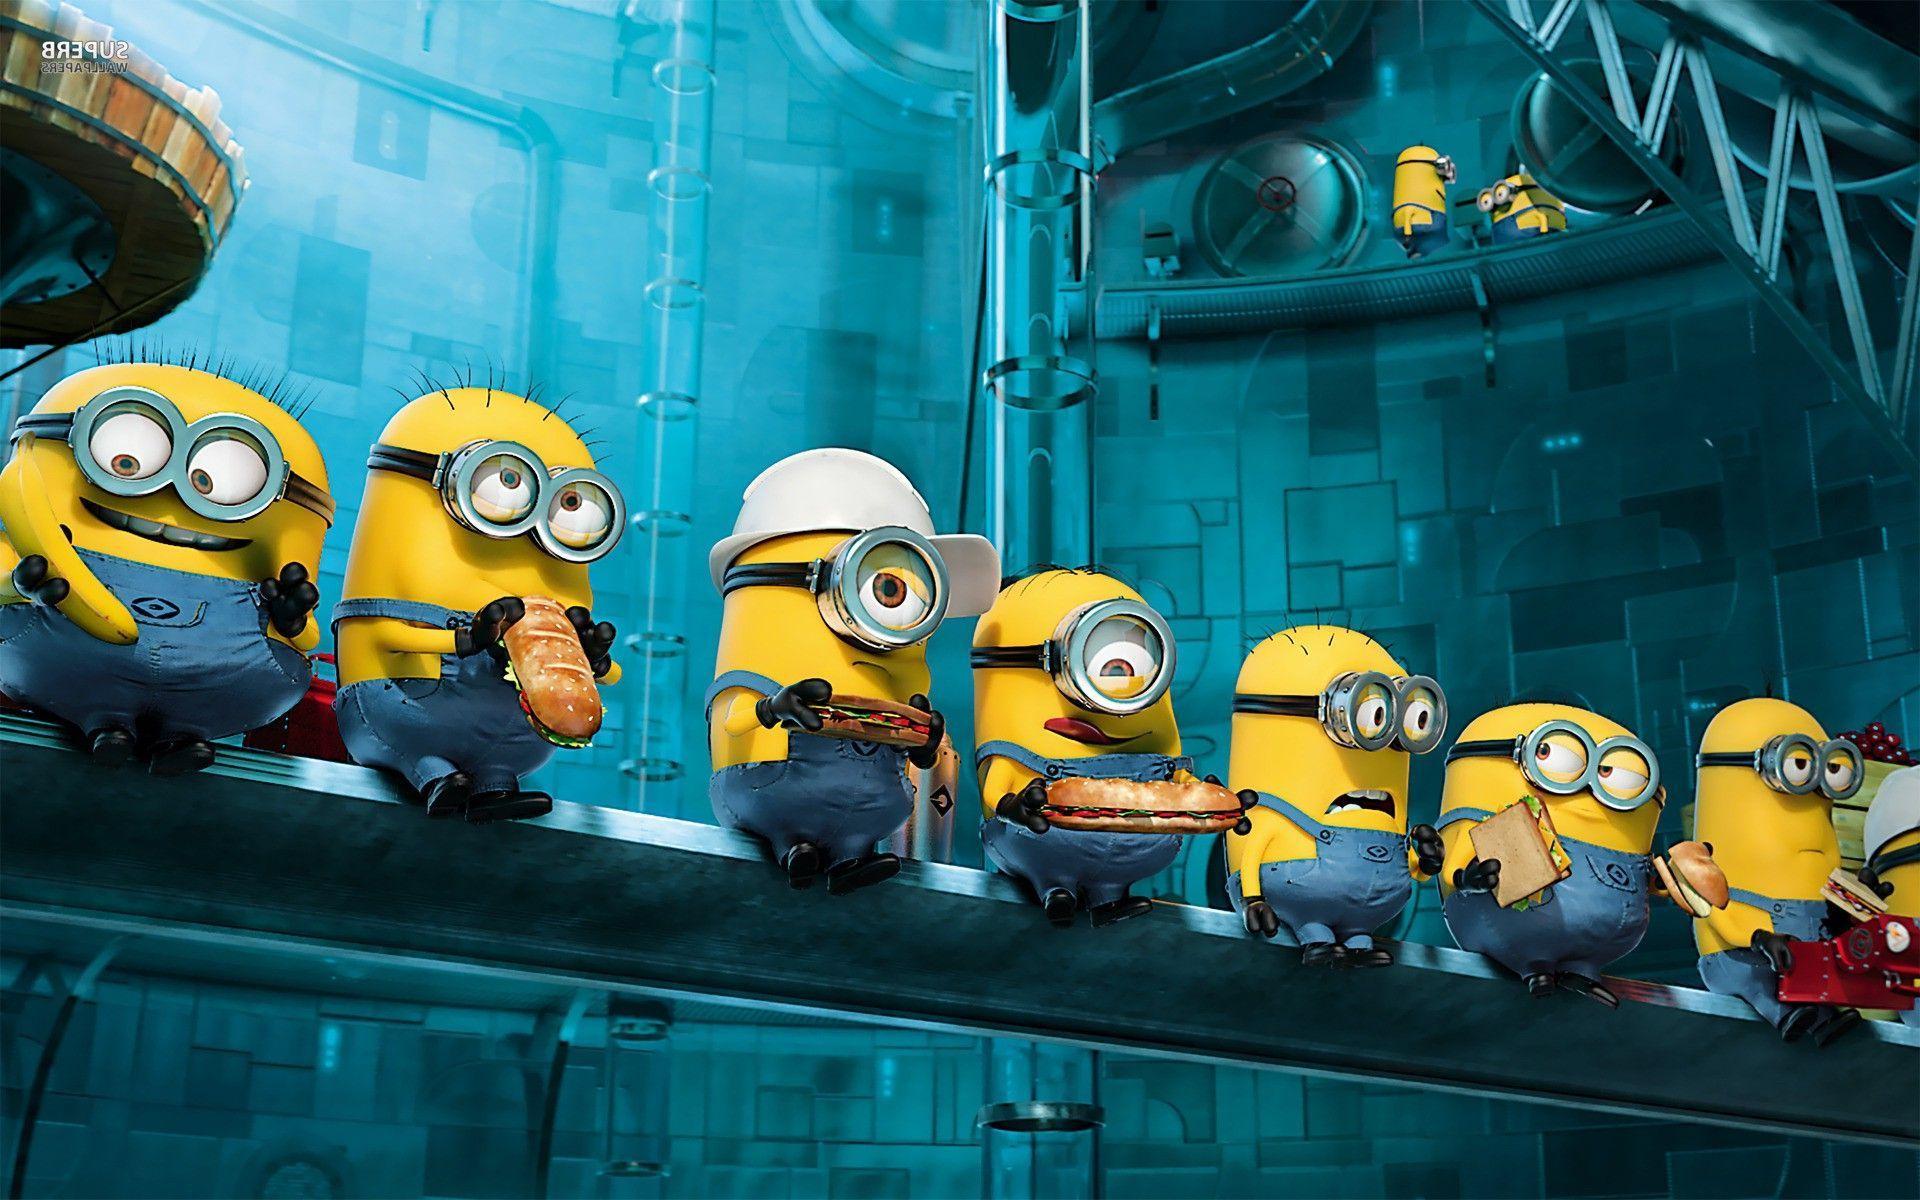 wallpaperres com minions movie wallpaper 01